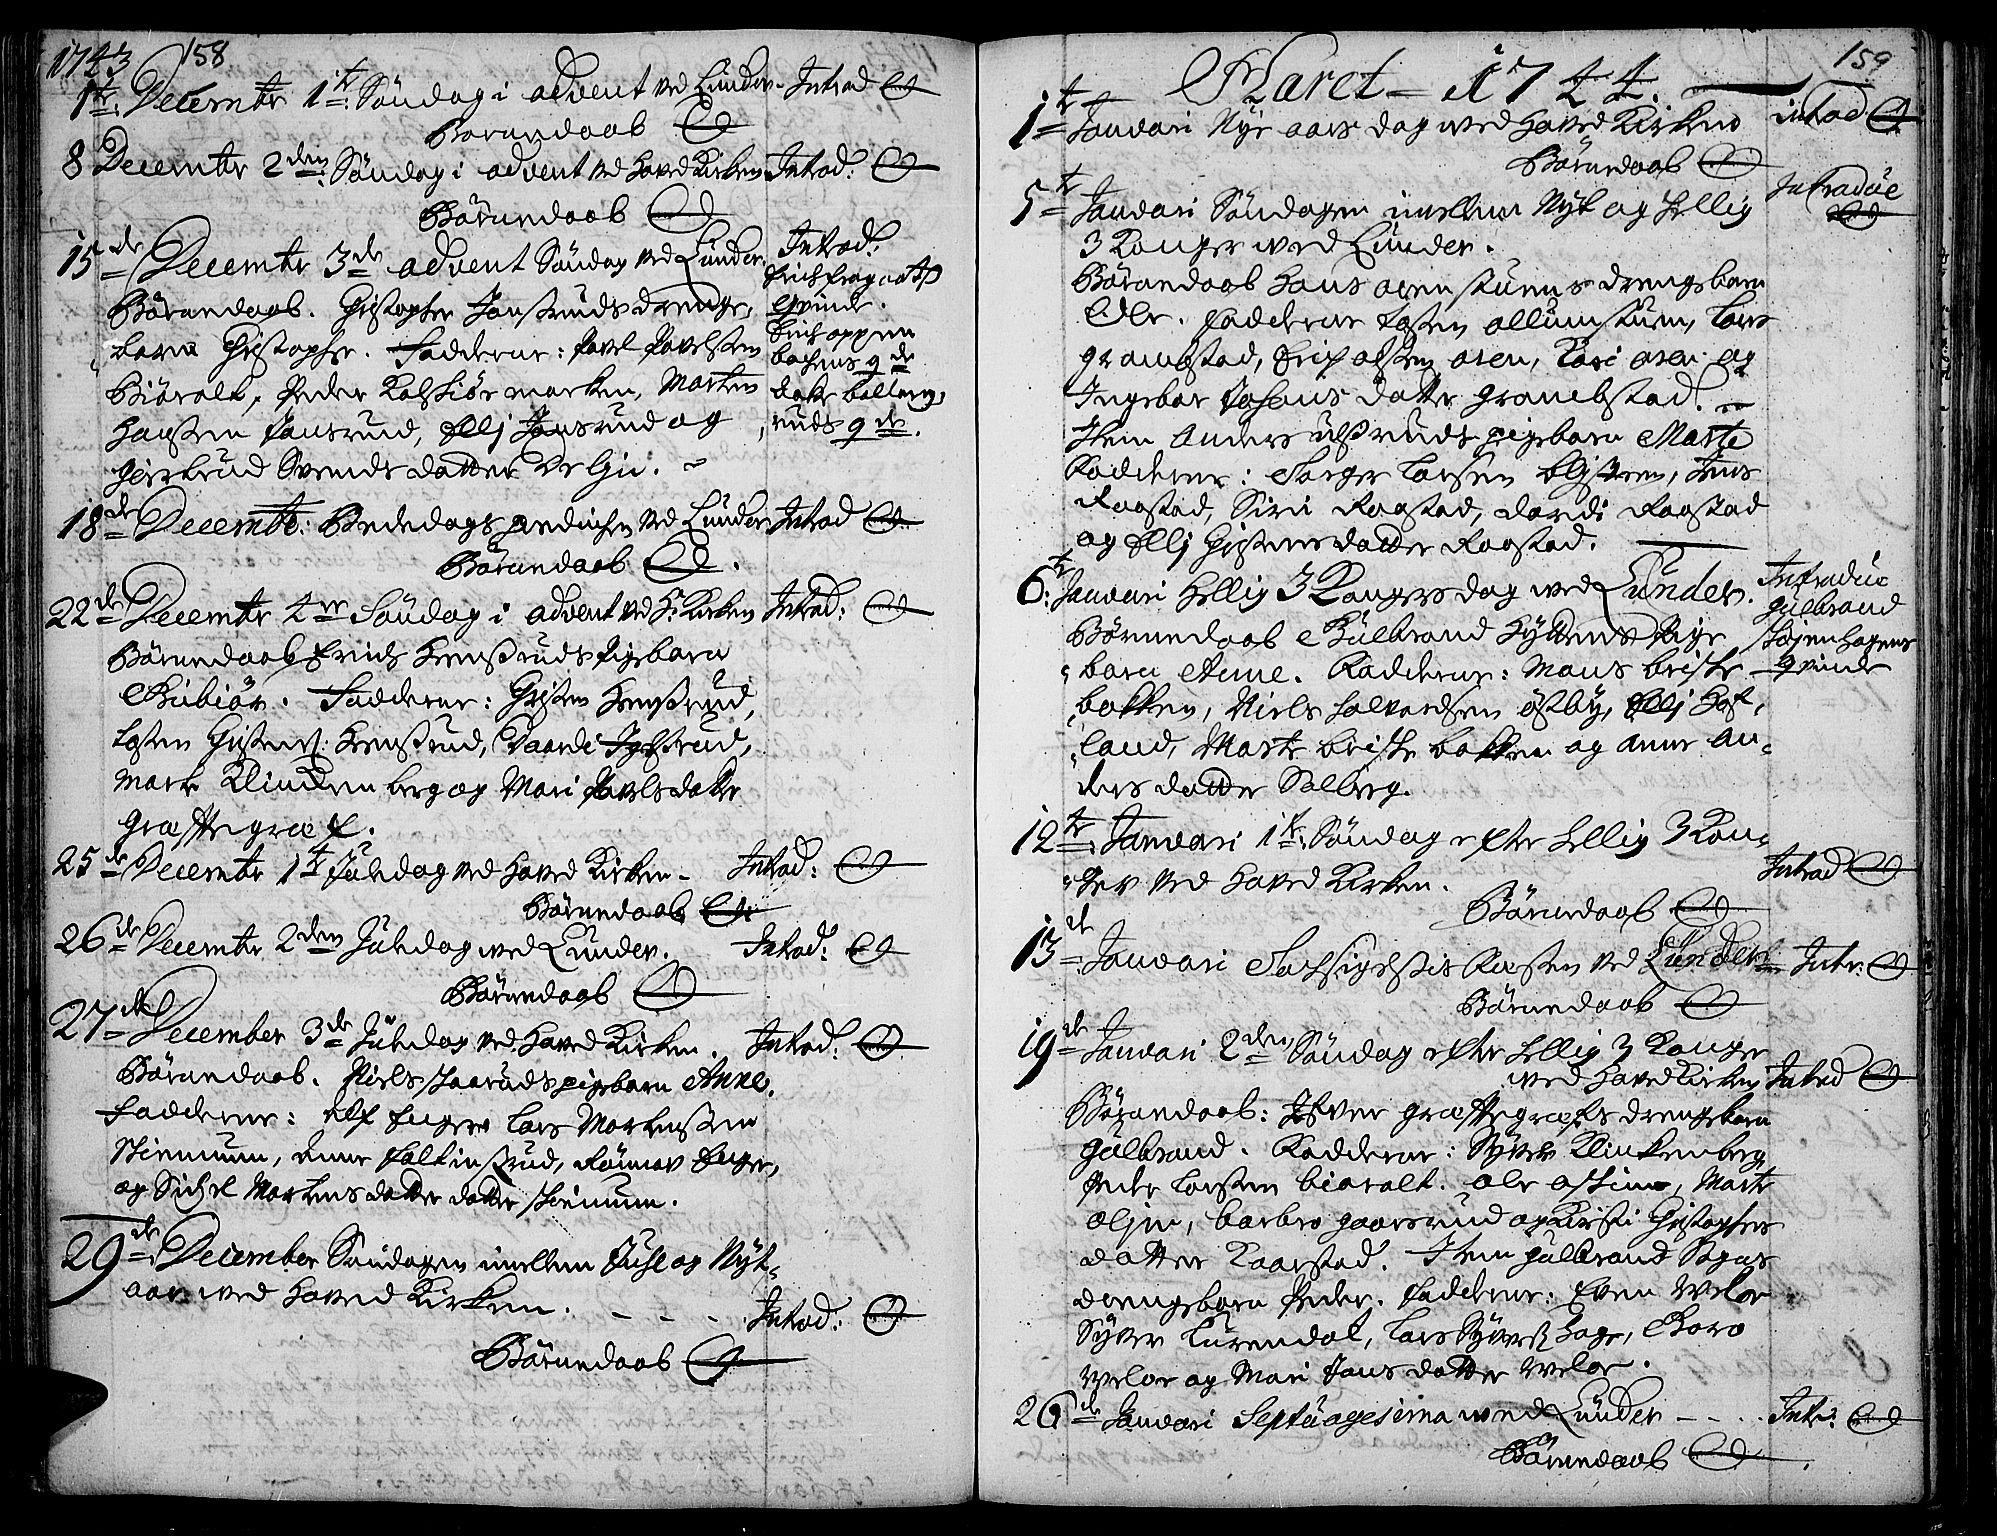 SAH, Jevnaker prestekontor, Ministerialbok nr. 2, 1725-1751, s. 158-159